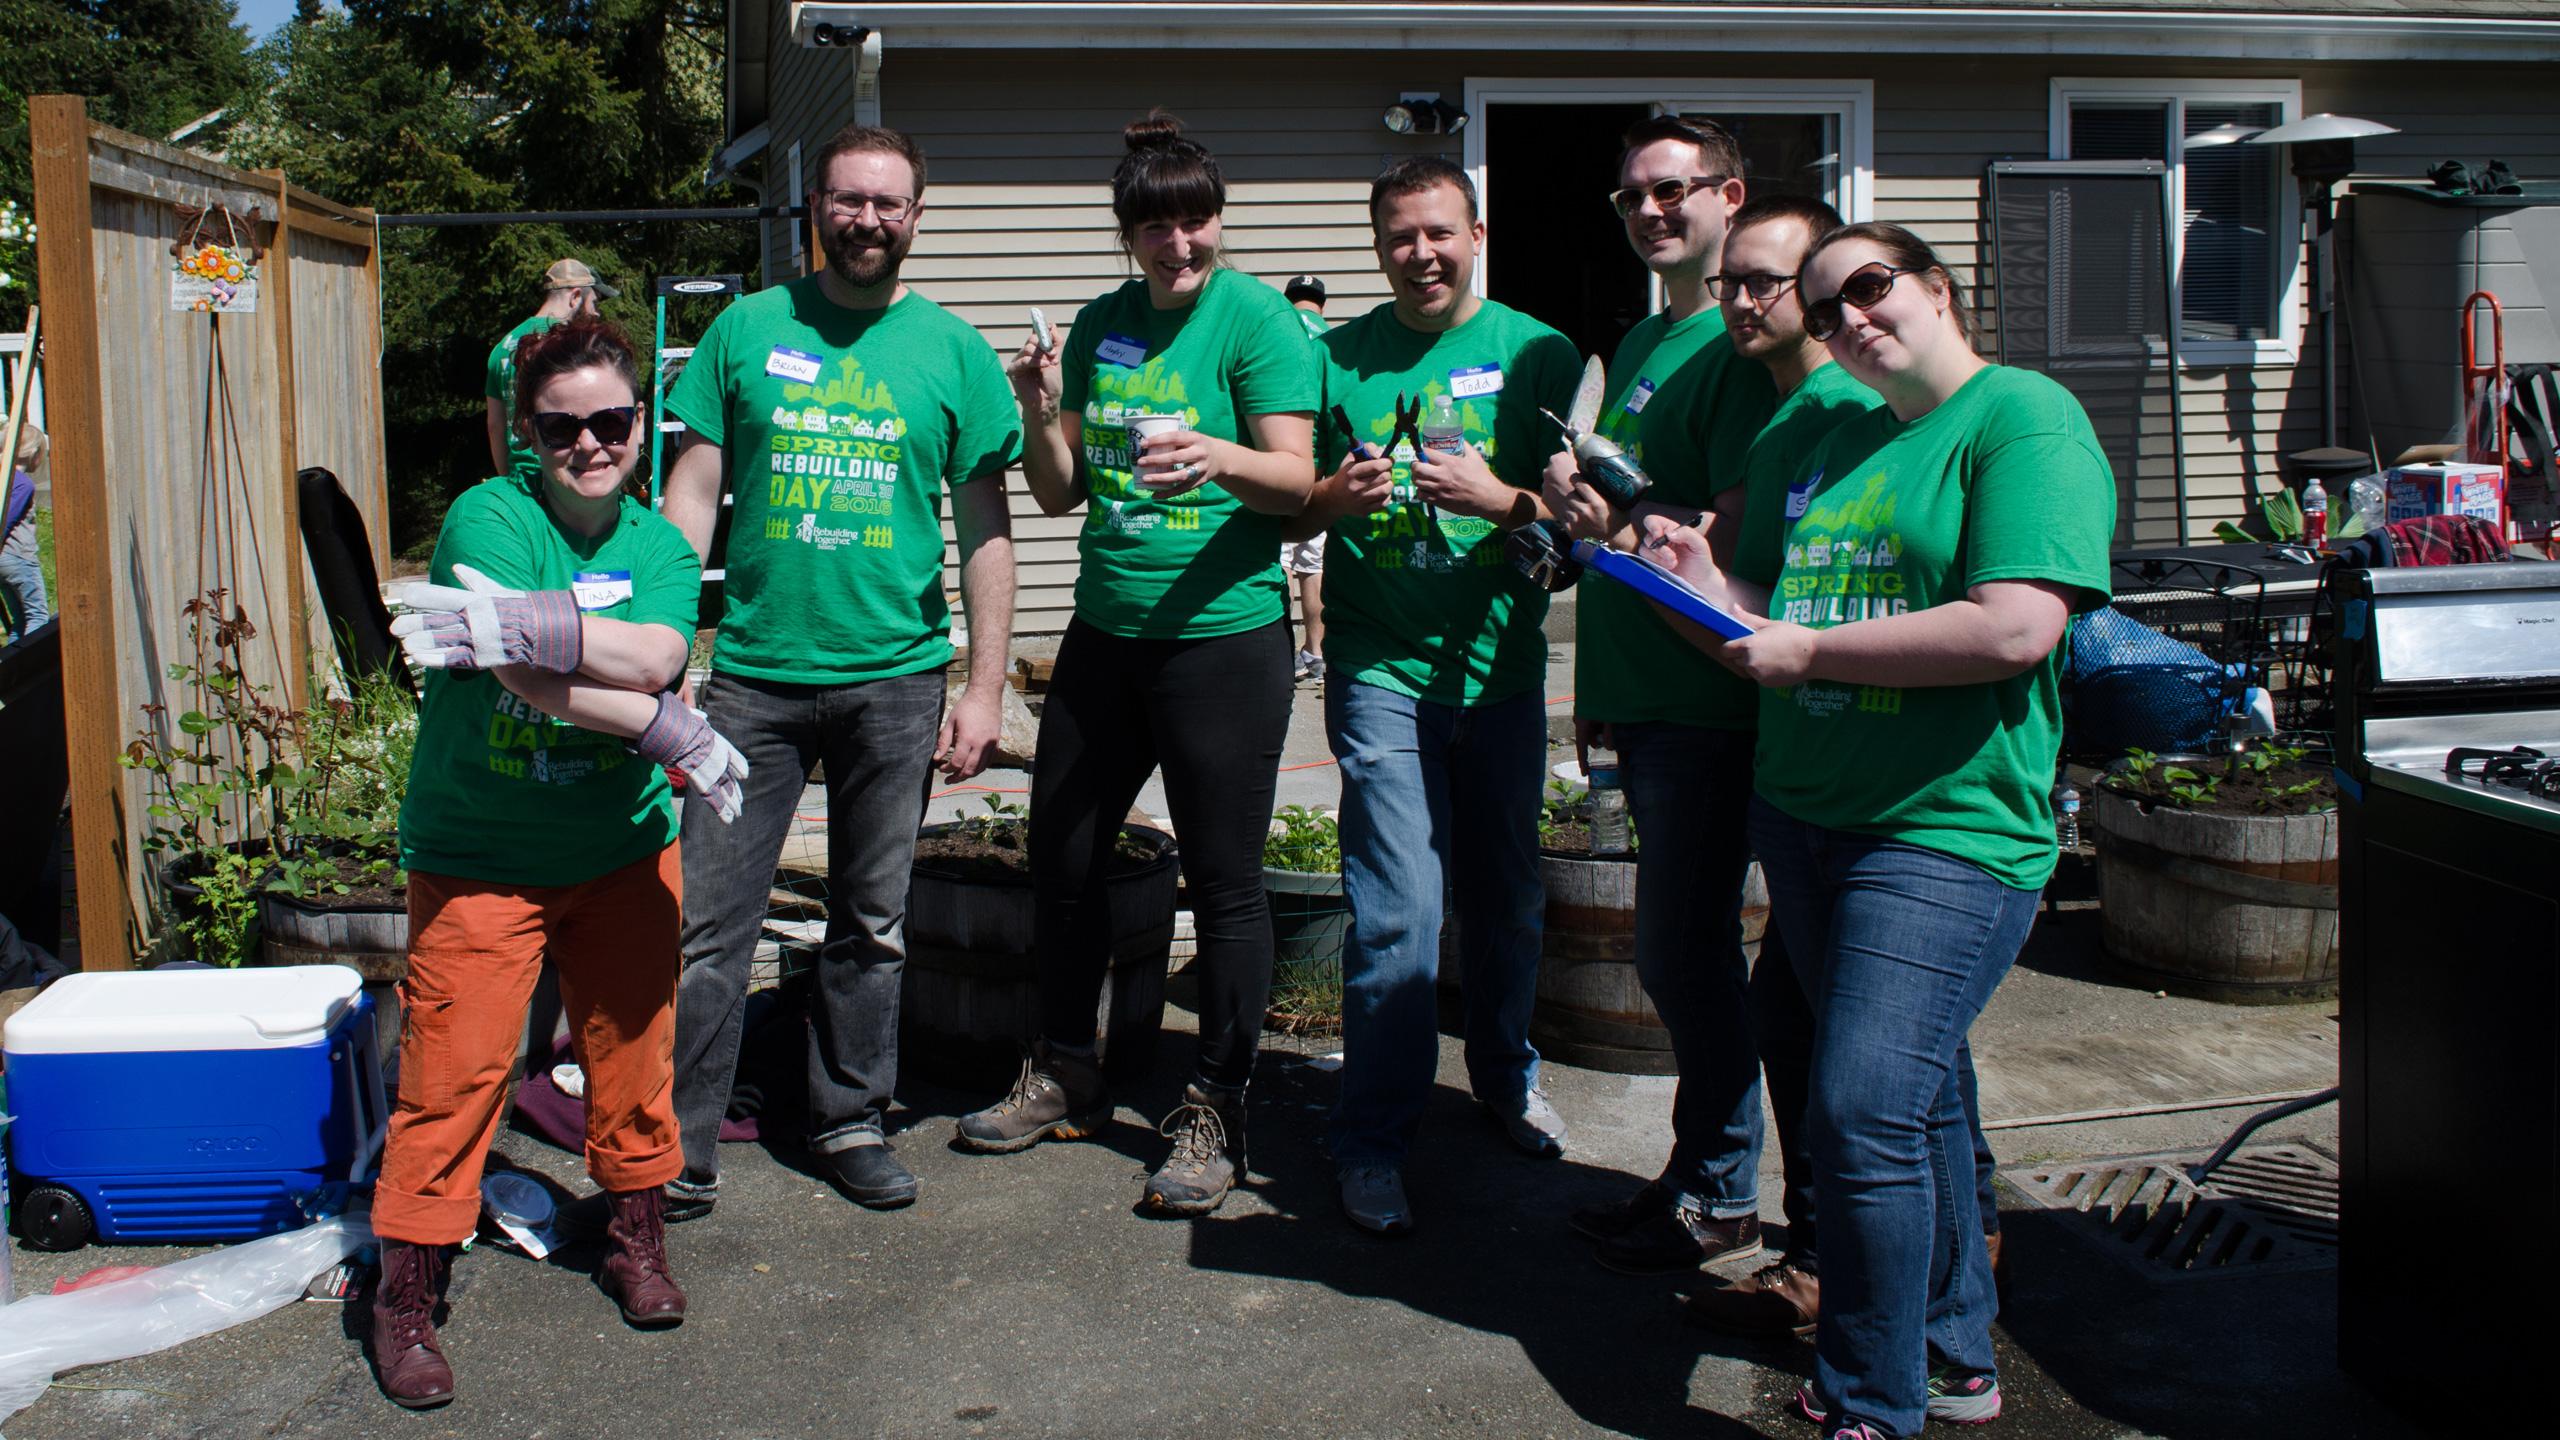 Rebuilding Together Seattle: Board & Vellum Volunteers –